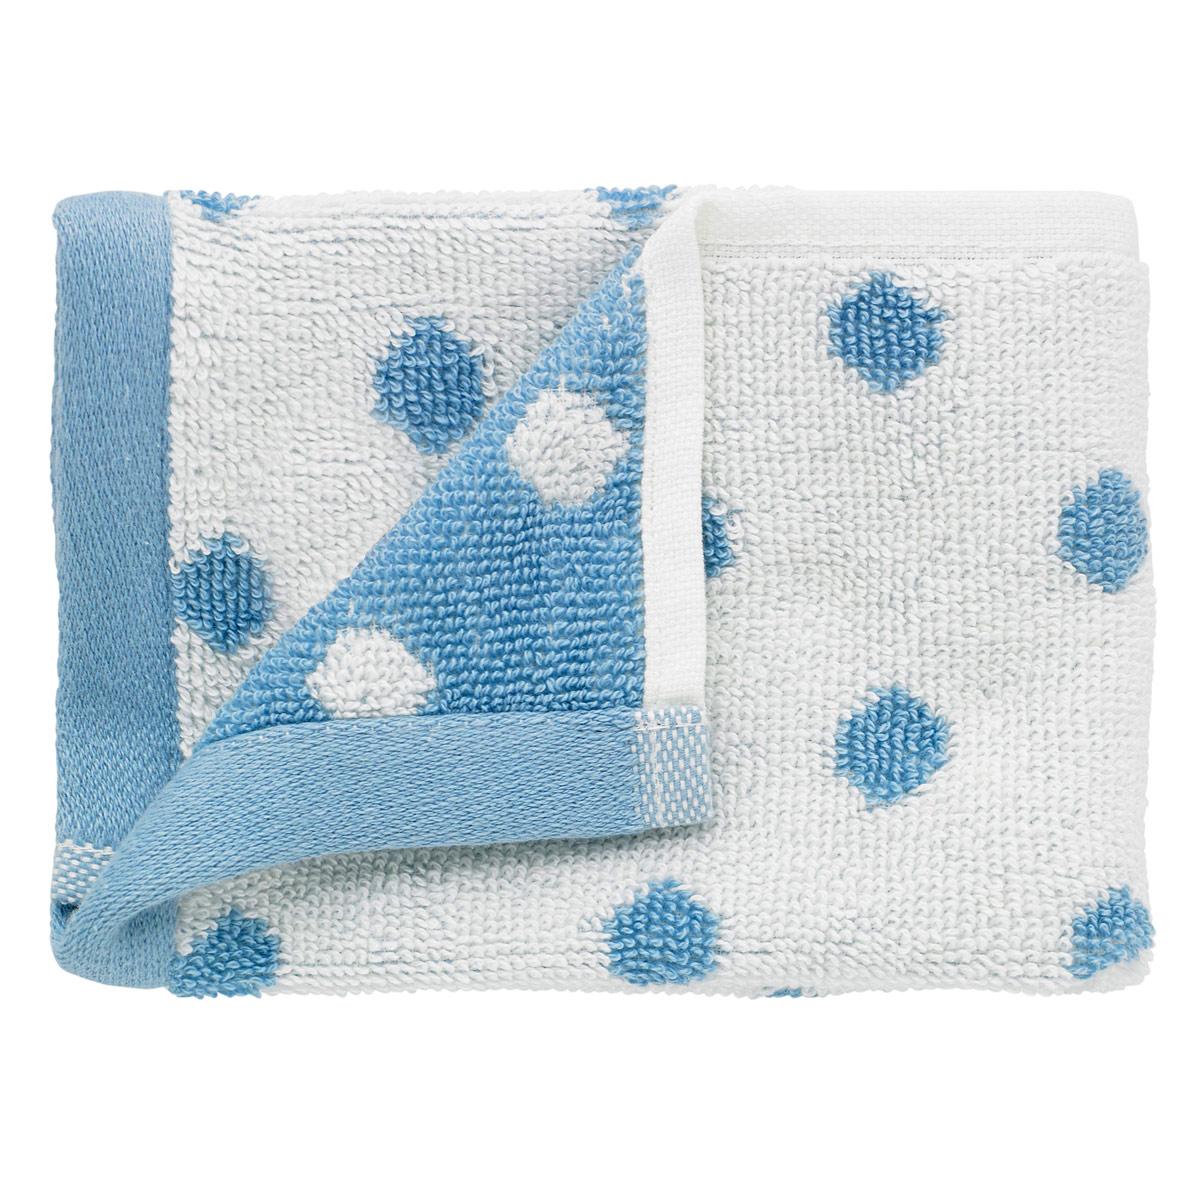 cath kidston handt cher button spot blue online kaufen emil paula. Black Bedroom Furniture Sets. Home Design Ideas